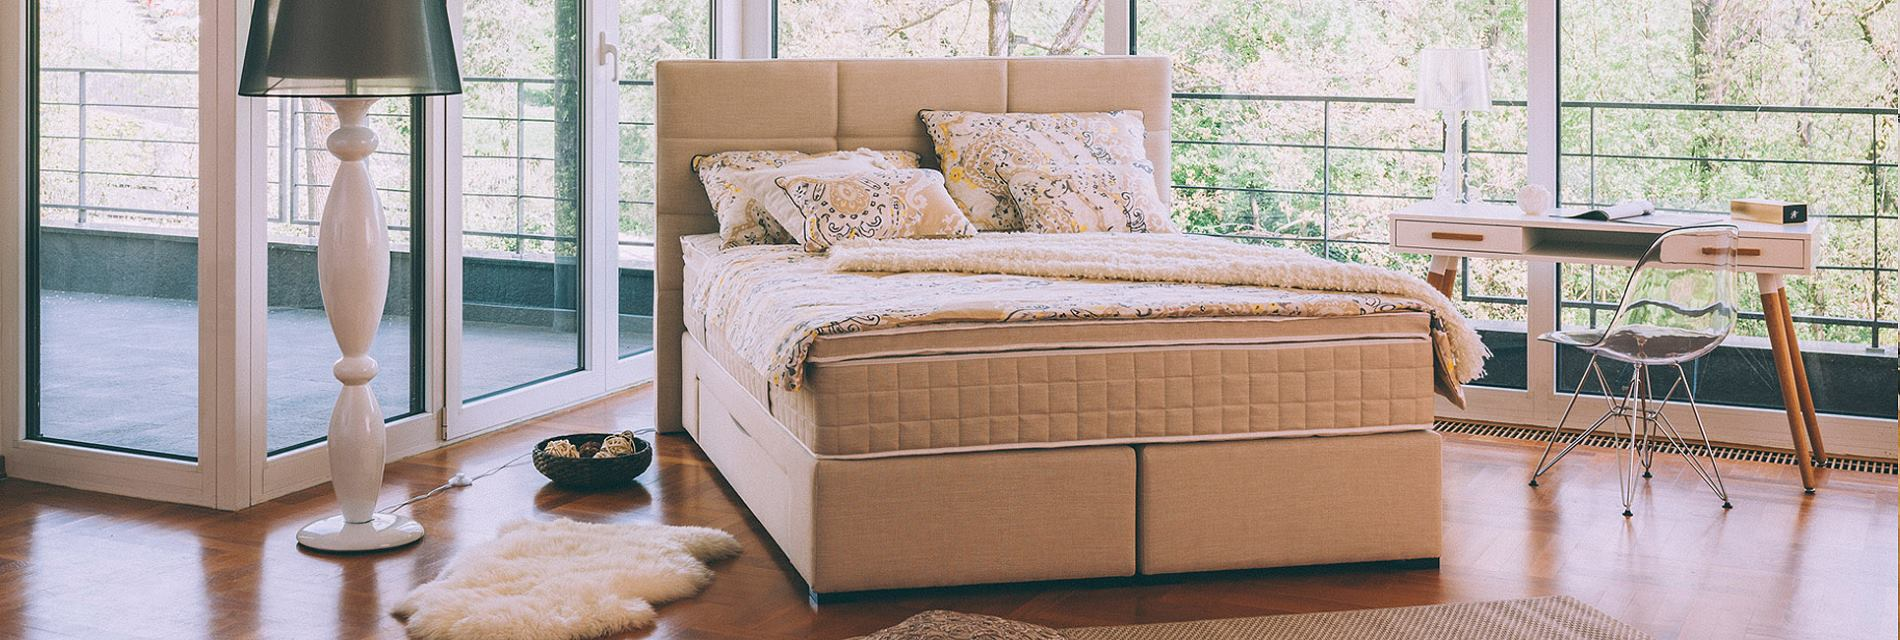 PERFECTA DREAMS Krevet New York pruža vam vrhunsku udobnost